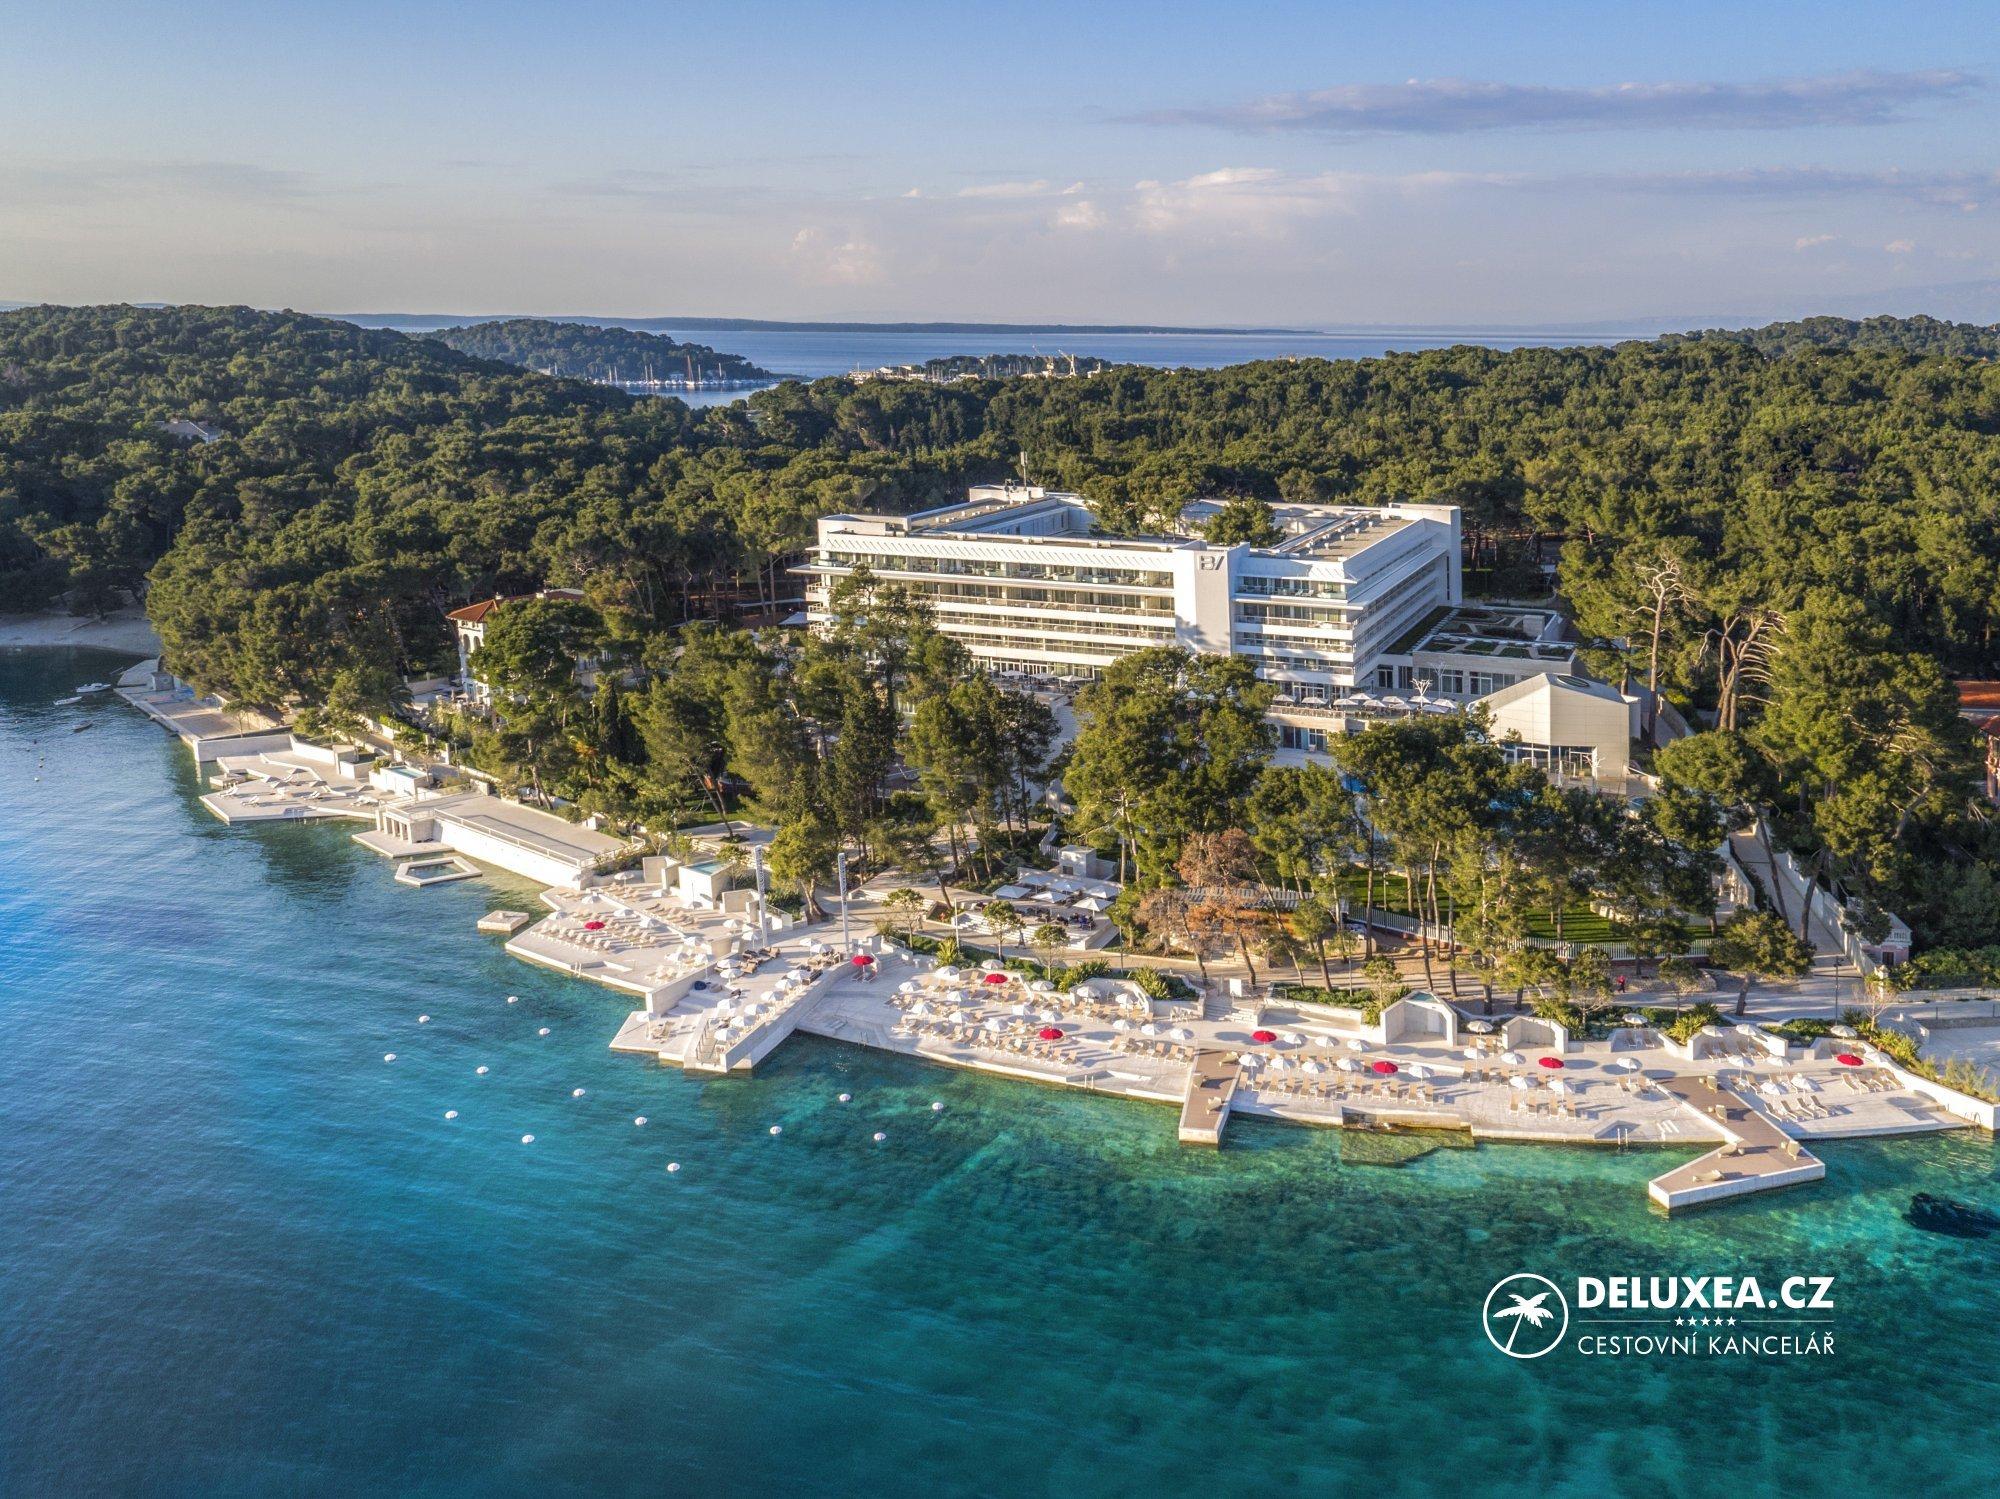 Chorvatsko menit peniaze jbakos